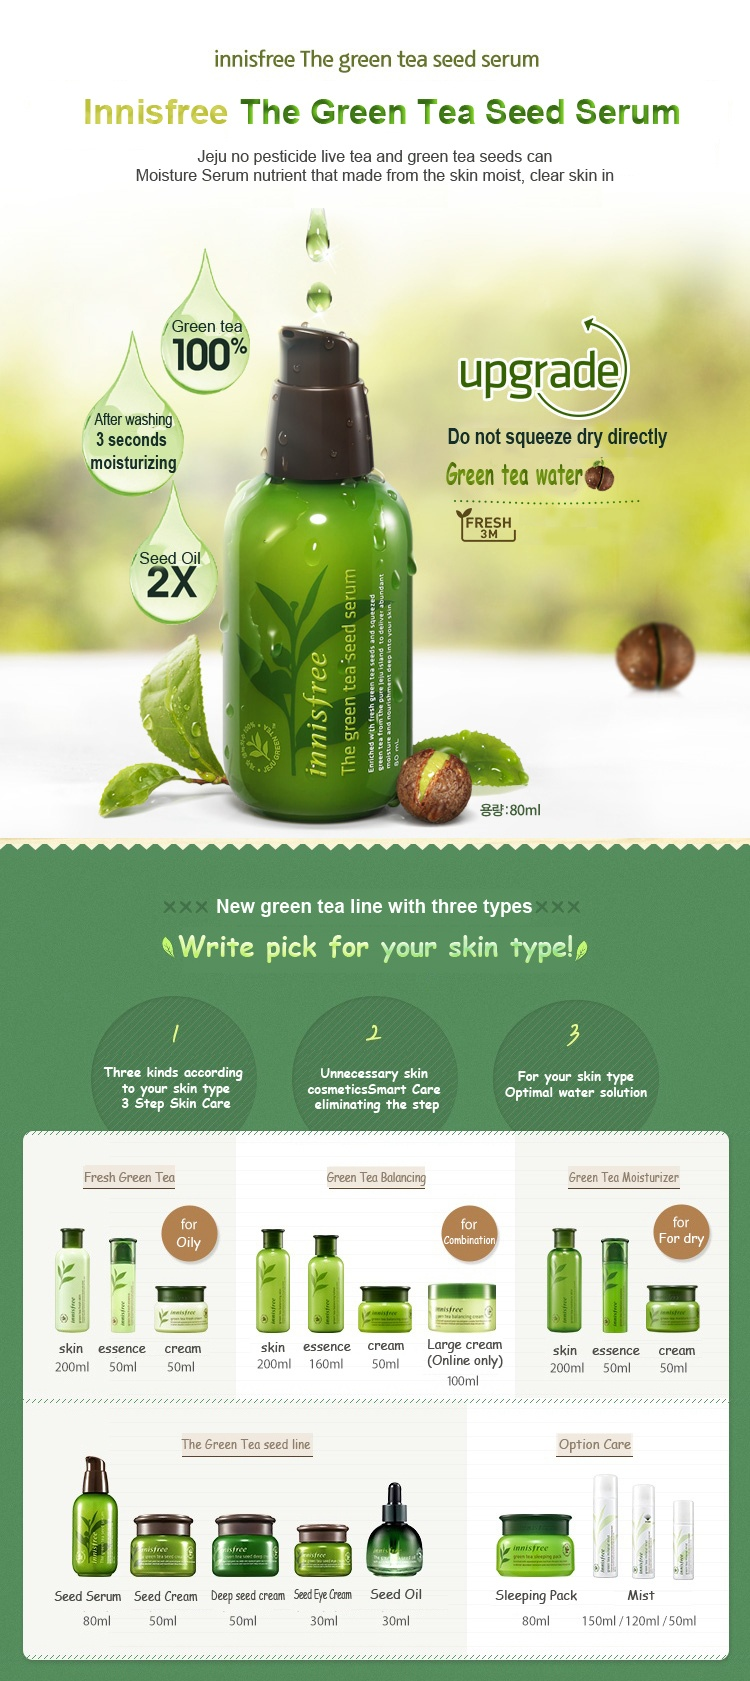 Innisfree The Green Tea Seed Serum 80ml Lazada Singapore Specifications Of